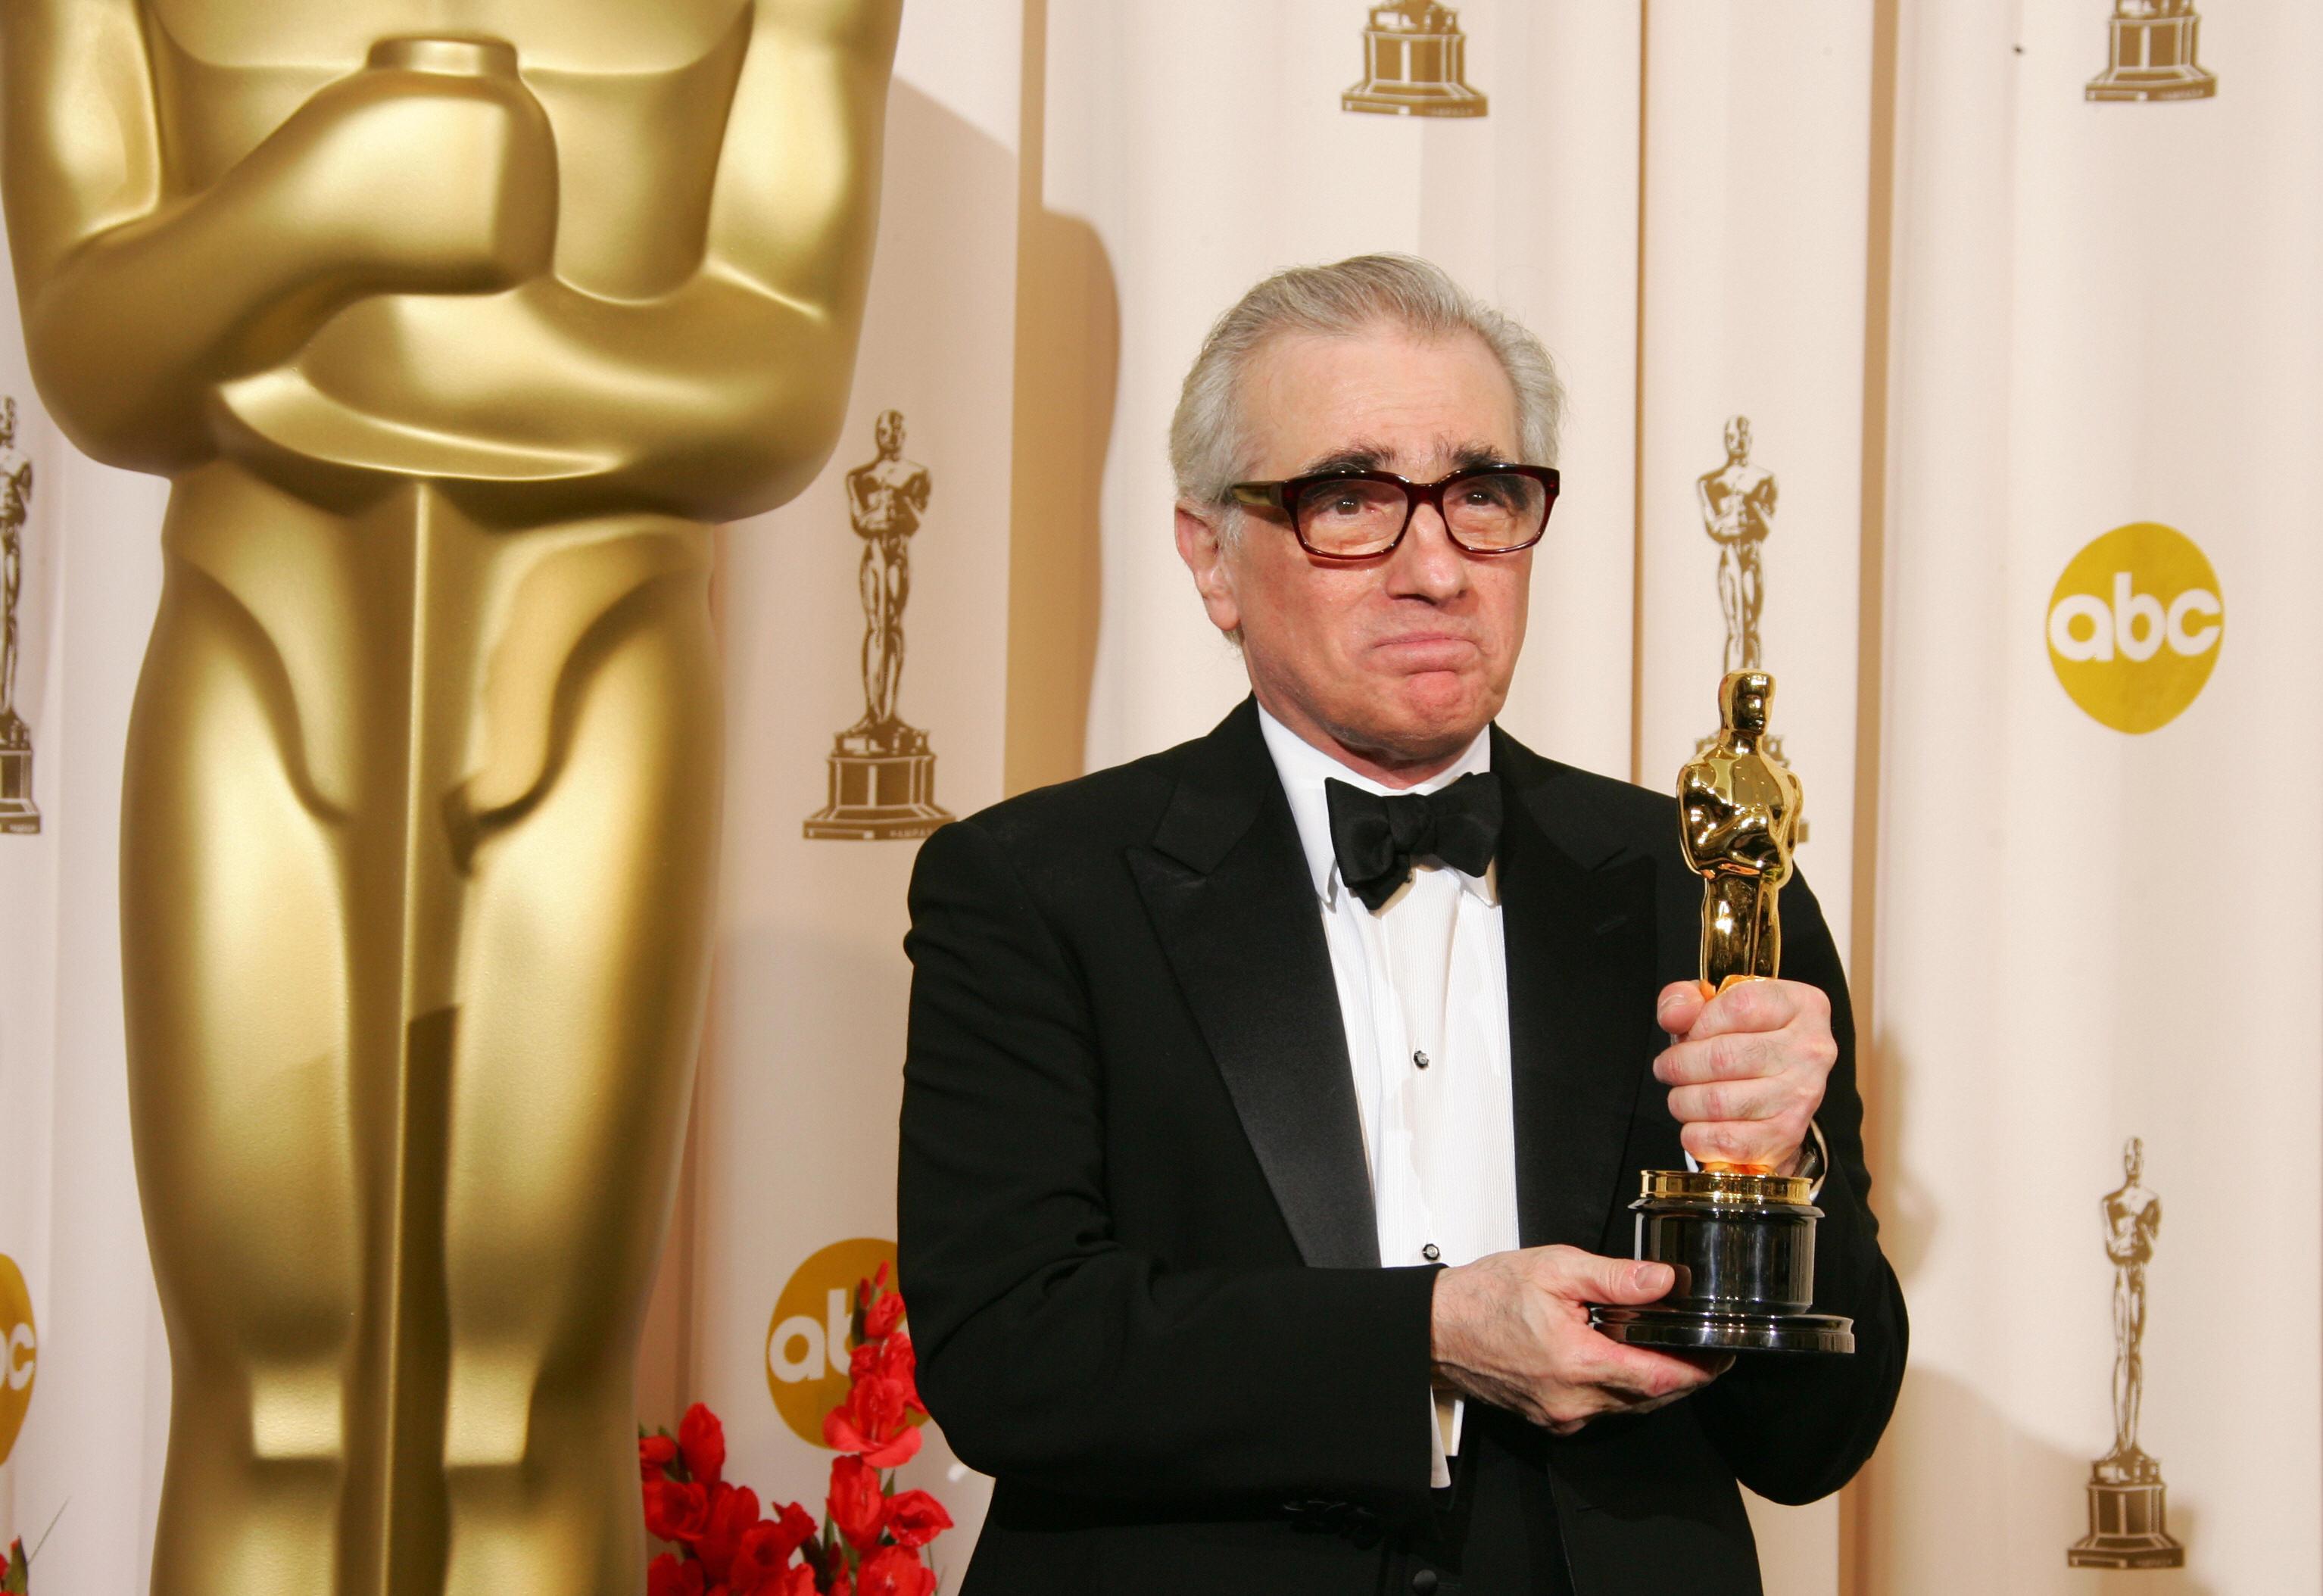 Martin Scorsese's net worth was already high before he won an Oscar for best director.